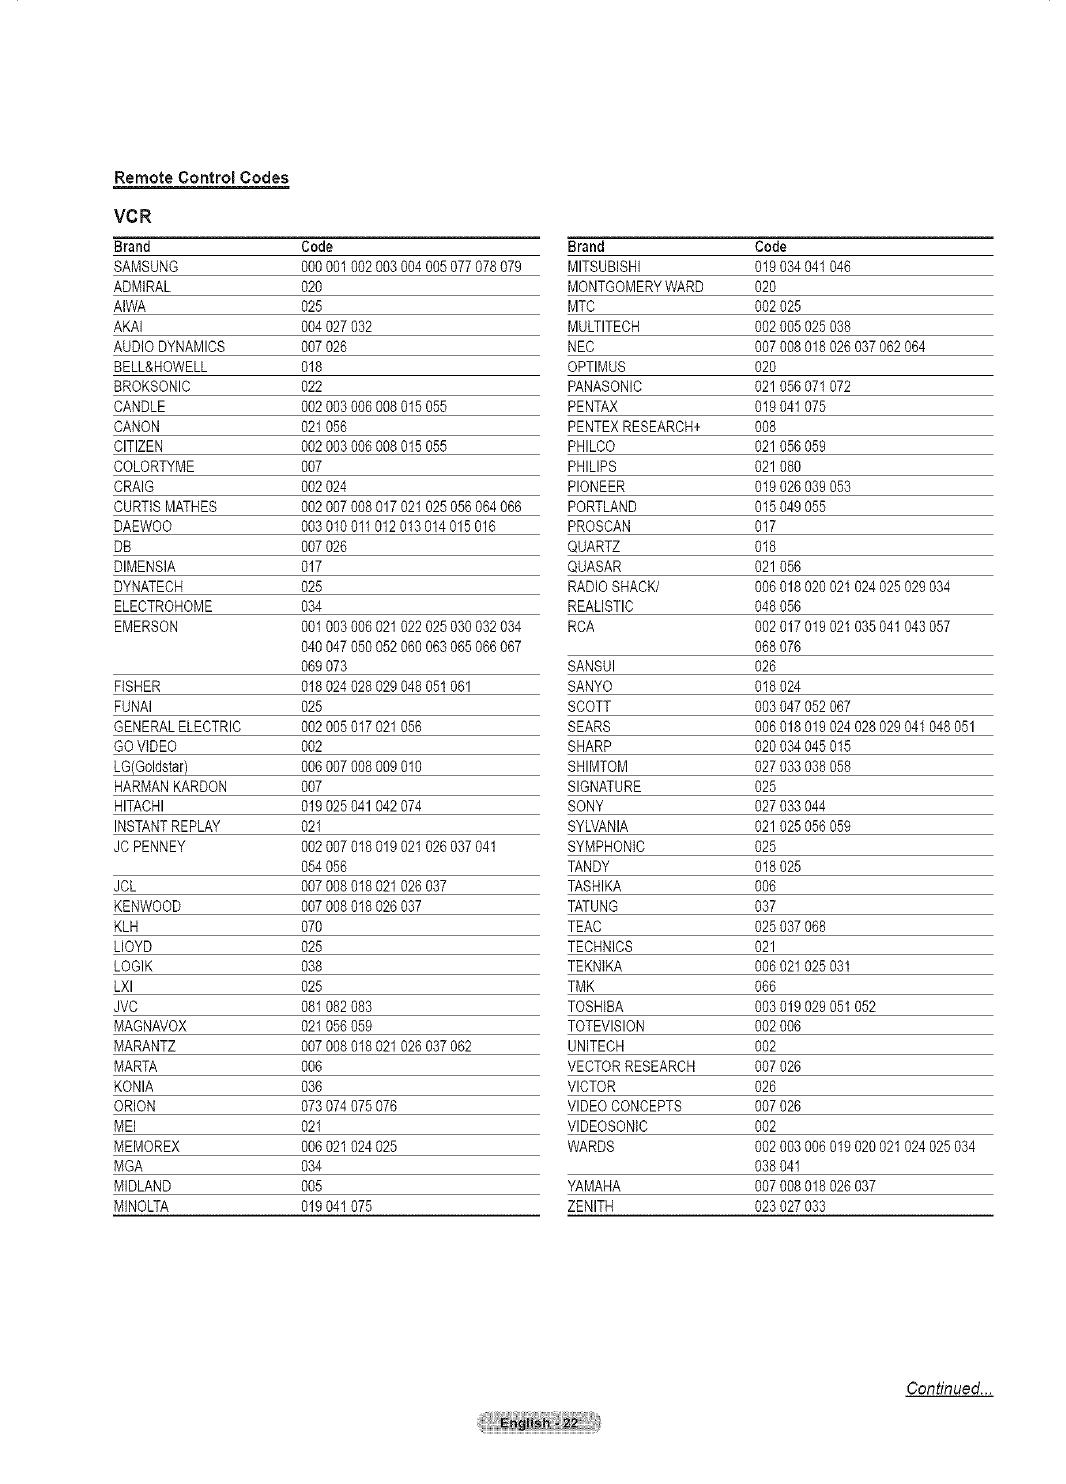 Samsung HP T4254 User Manual PLASMA TELEVISION Manuals And